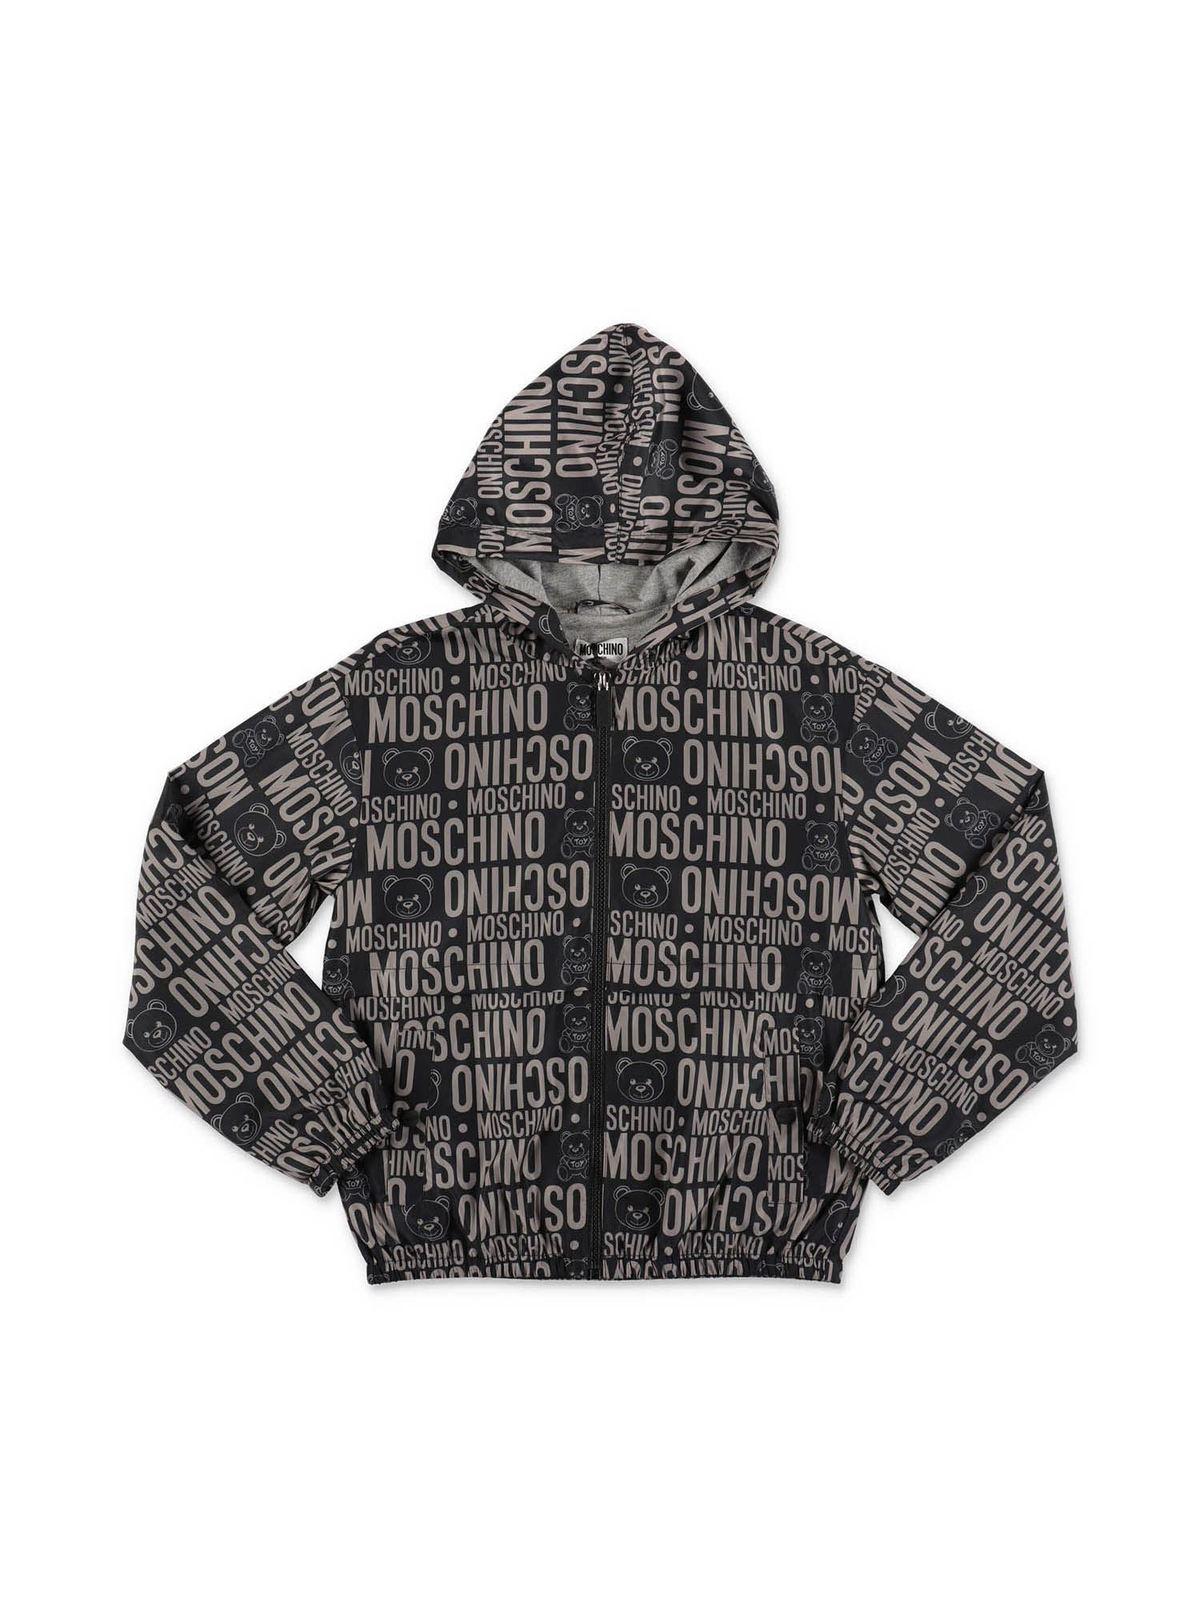 Moschino Kids' Black Allover Logo Jacket